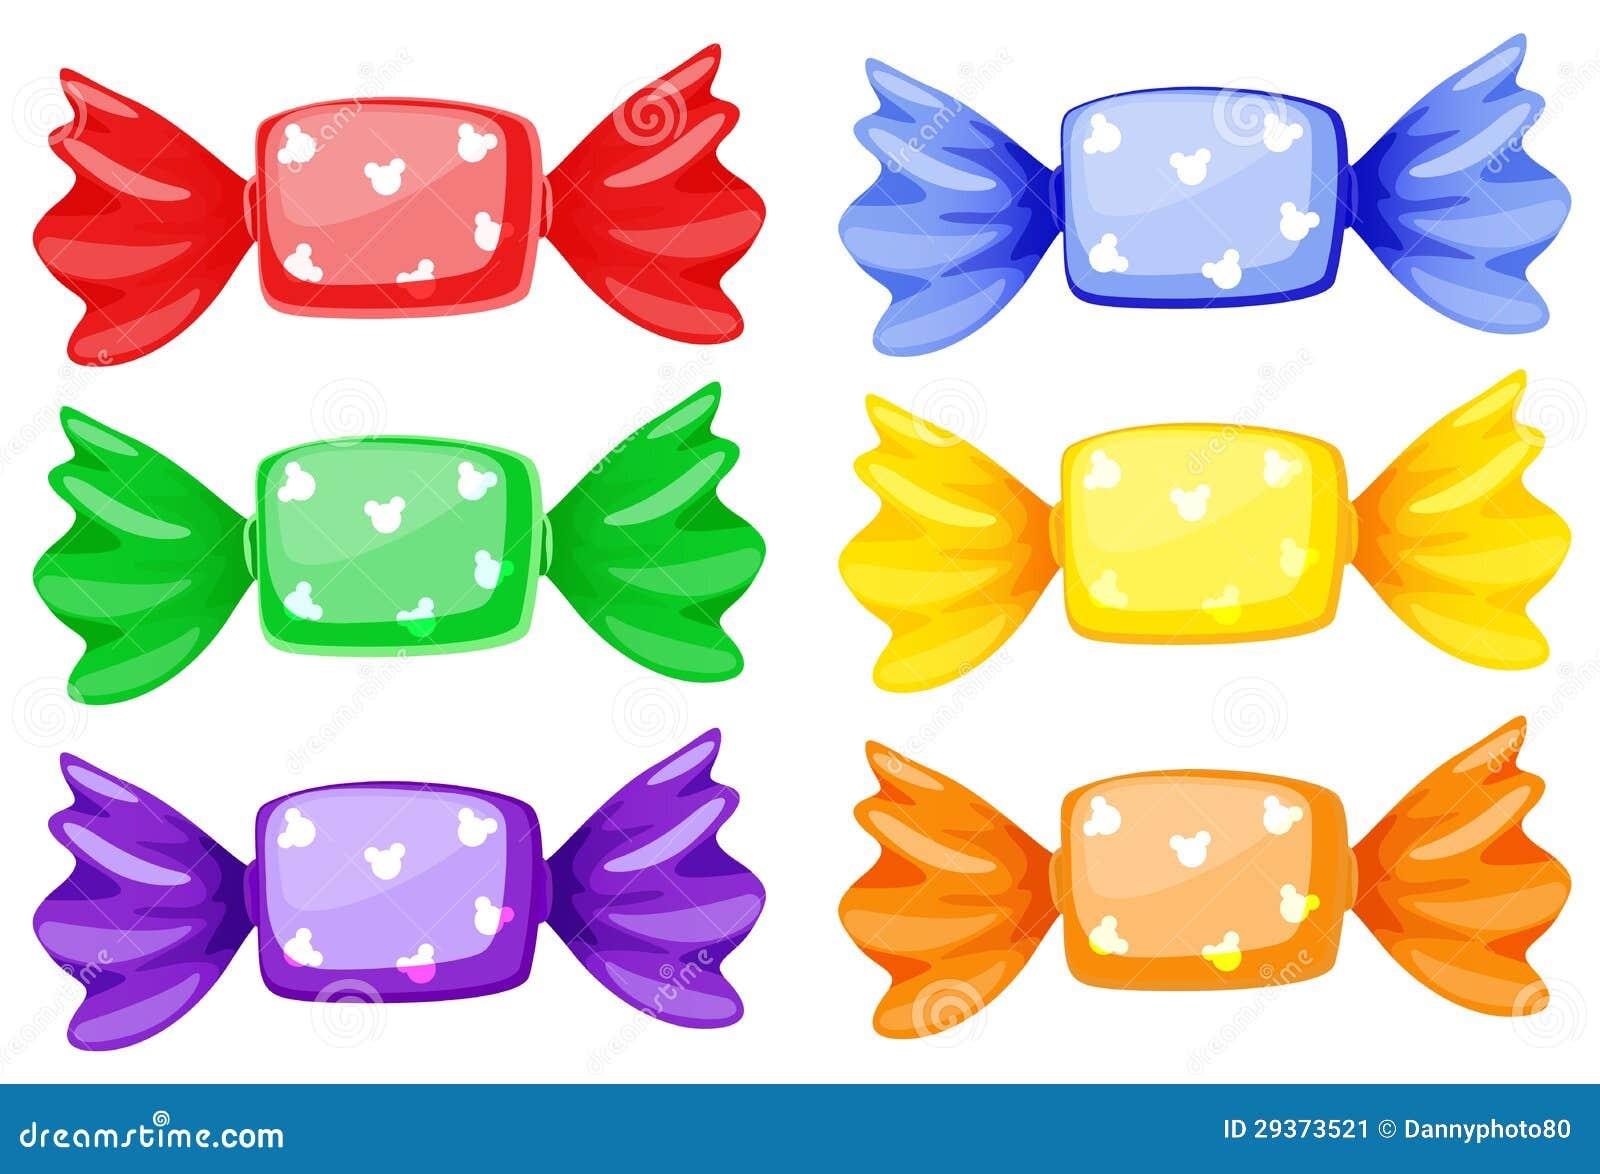 Bonbons stock abbildung illustration von kinder sechs 29373521 - Bonbons dessin ...